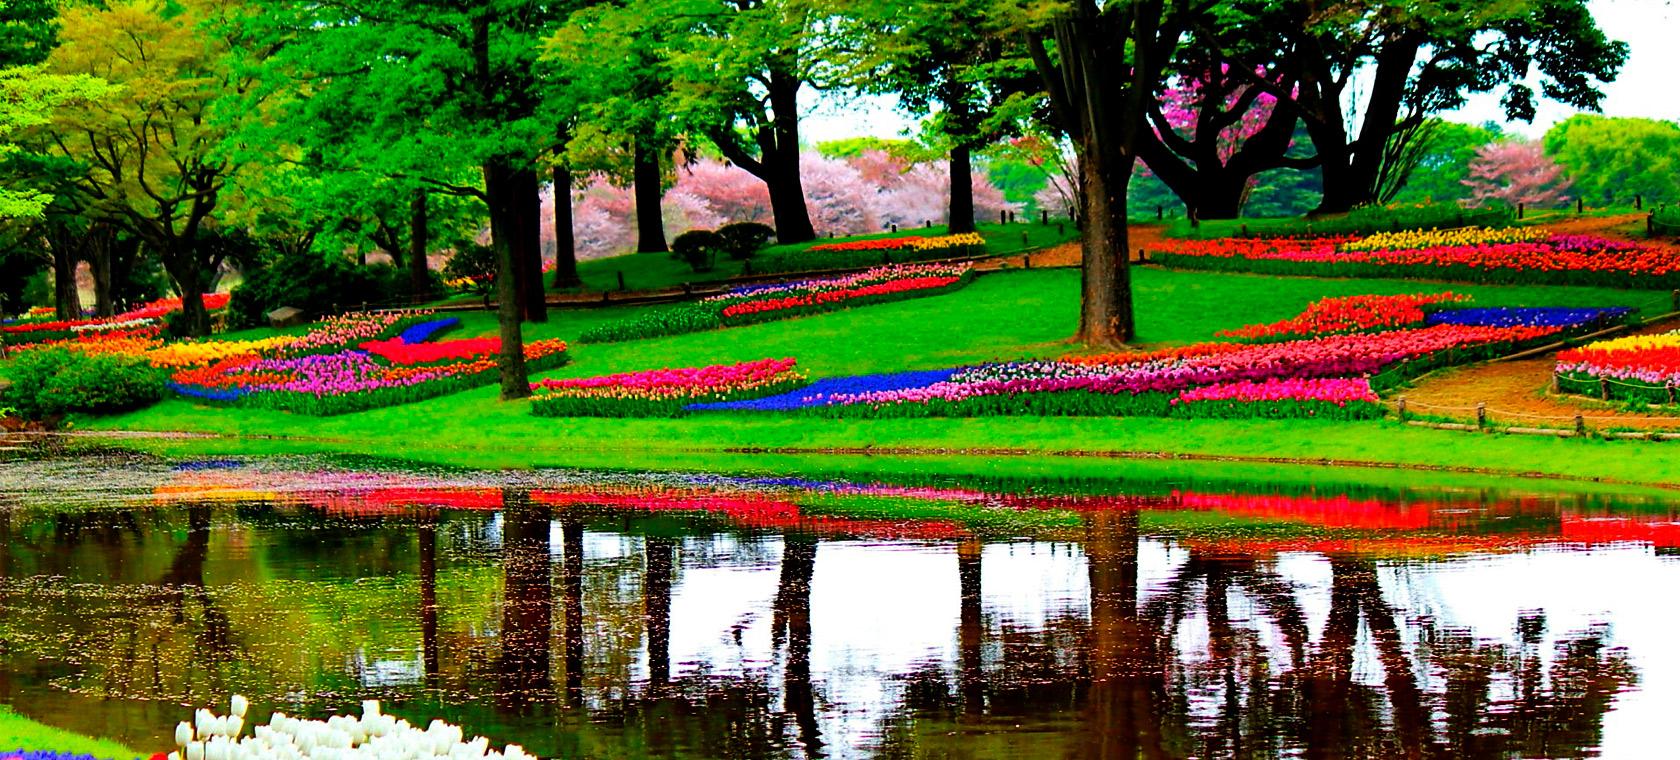 keukenhof gardens tour from amsterdam - Amsterdam Garden